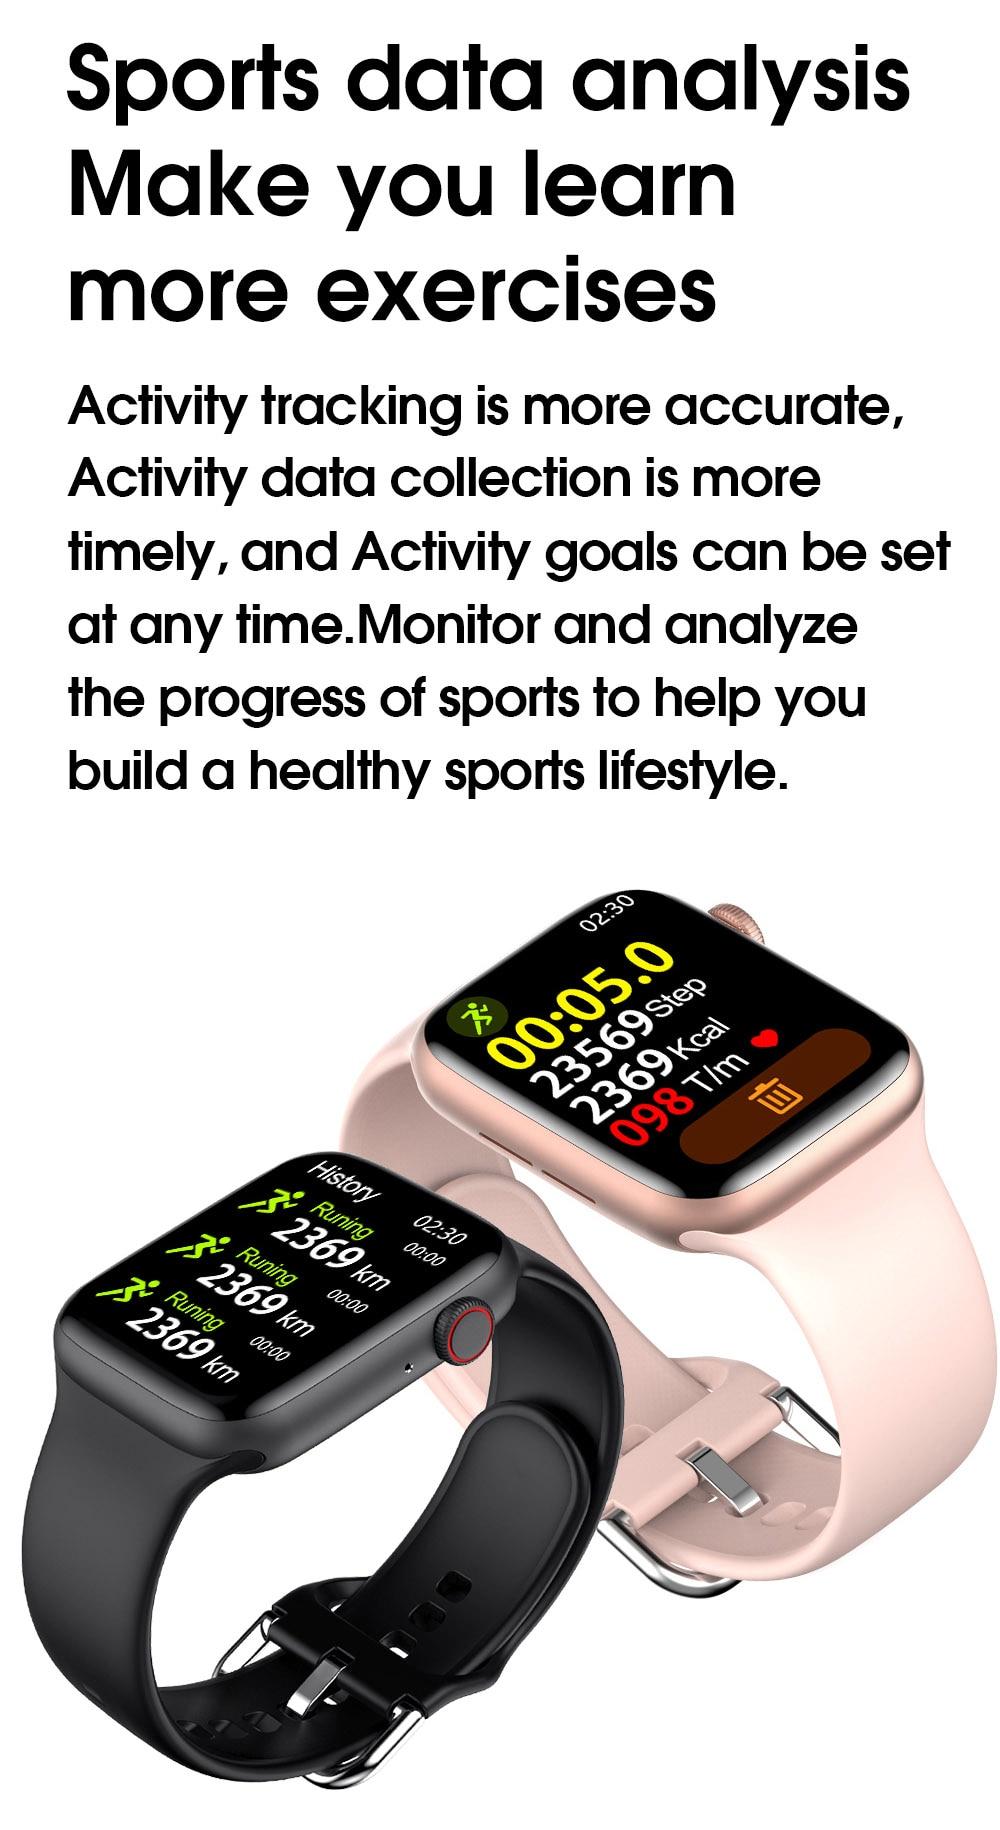 Hb6aa5357efdd4a05a574987d8fb5f17cP TREZER IWO W26+ Pro Smart Watch 1.75 Inch 320*385 Series 6 IPS Full Touch Screen Custom Watch Face Smartwatch Men Women PK HW22